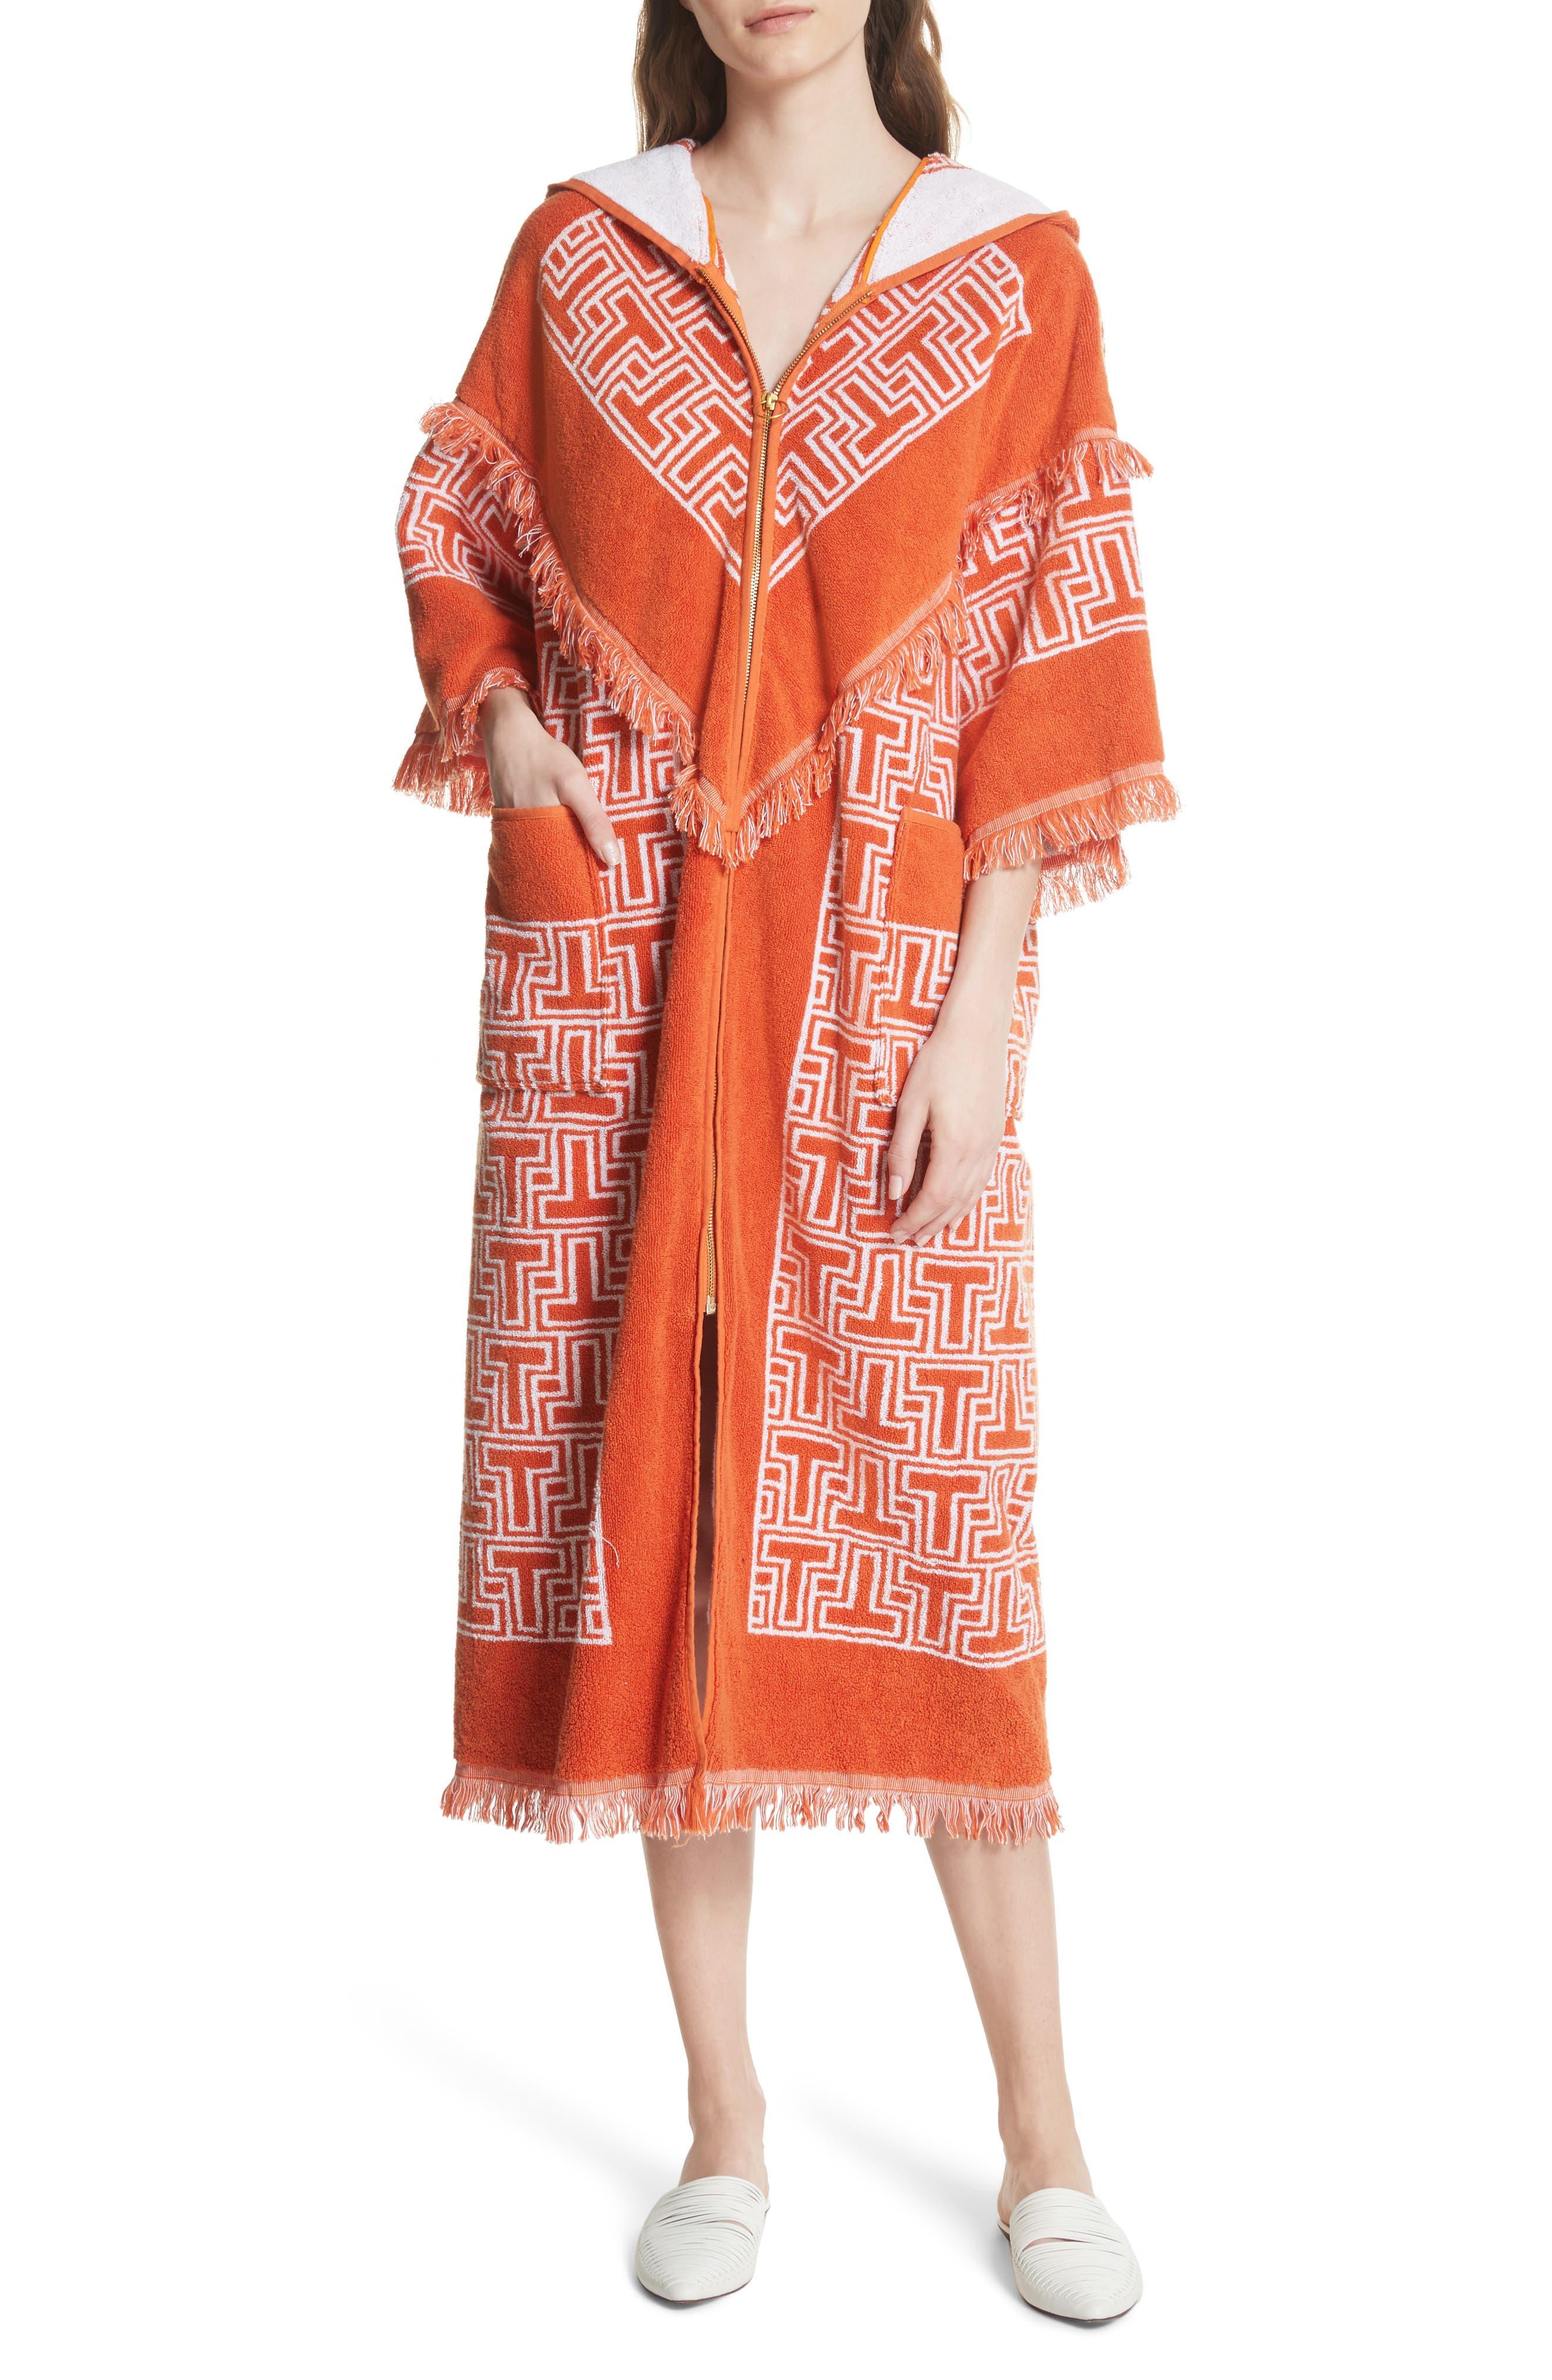 Tile T Terry Coat,                             Main thumbnail 1, color,                             Orange Towel Jacquard